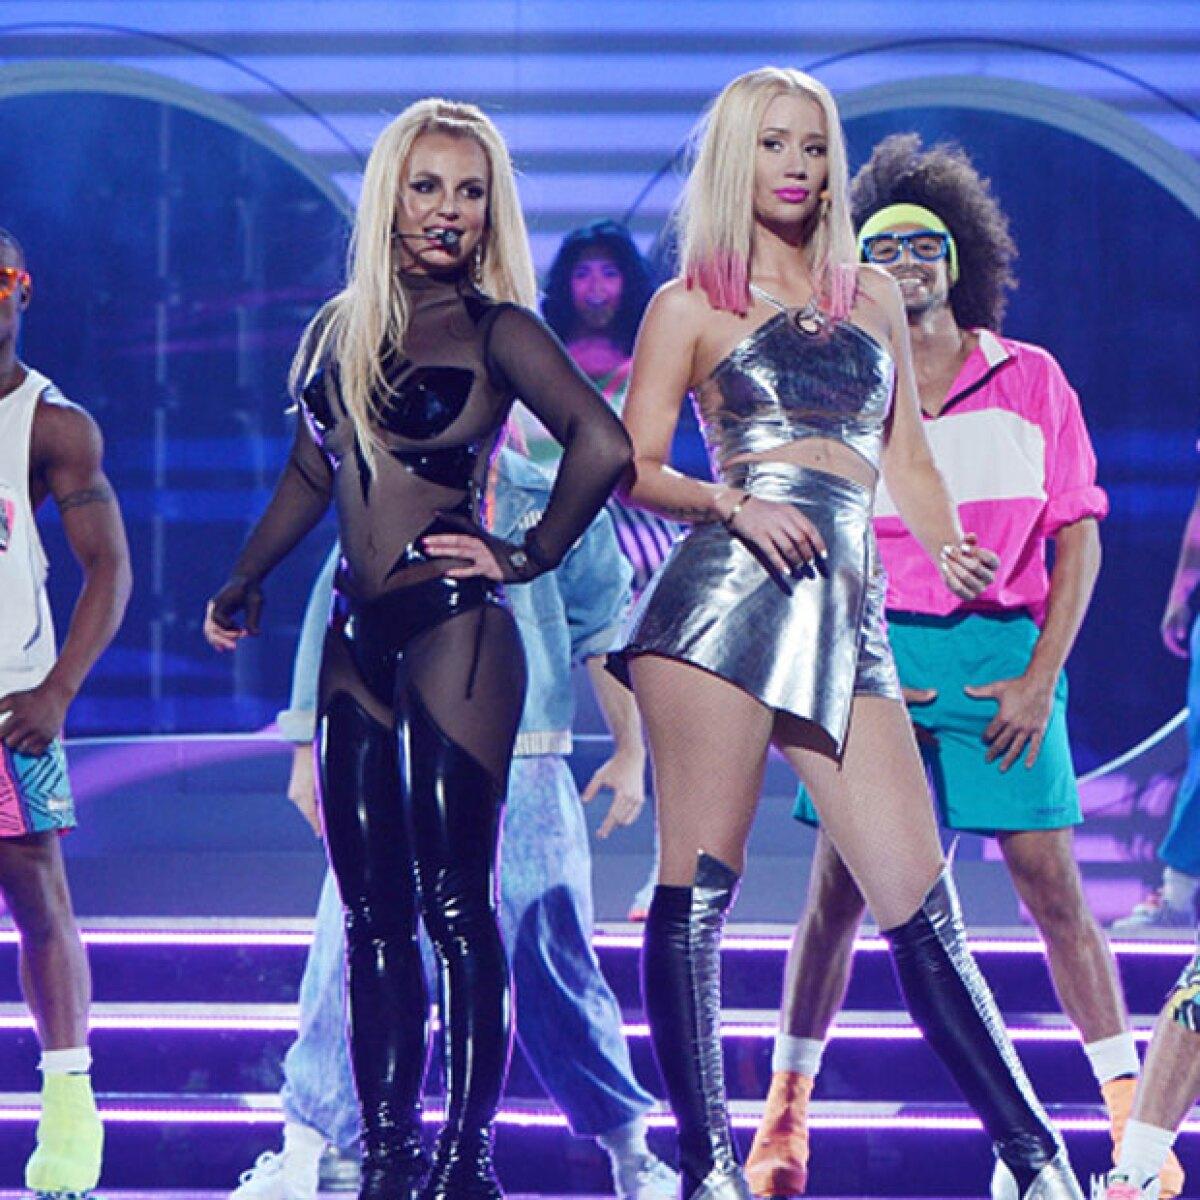 ¿Iggy Azalea culpa a Britney Spears por el fracaso de 'Pretty Girls'?